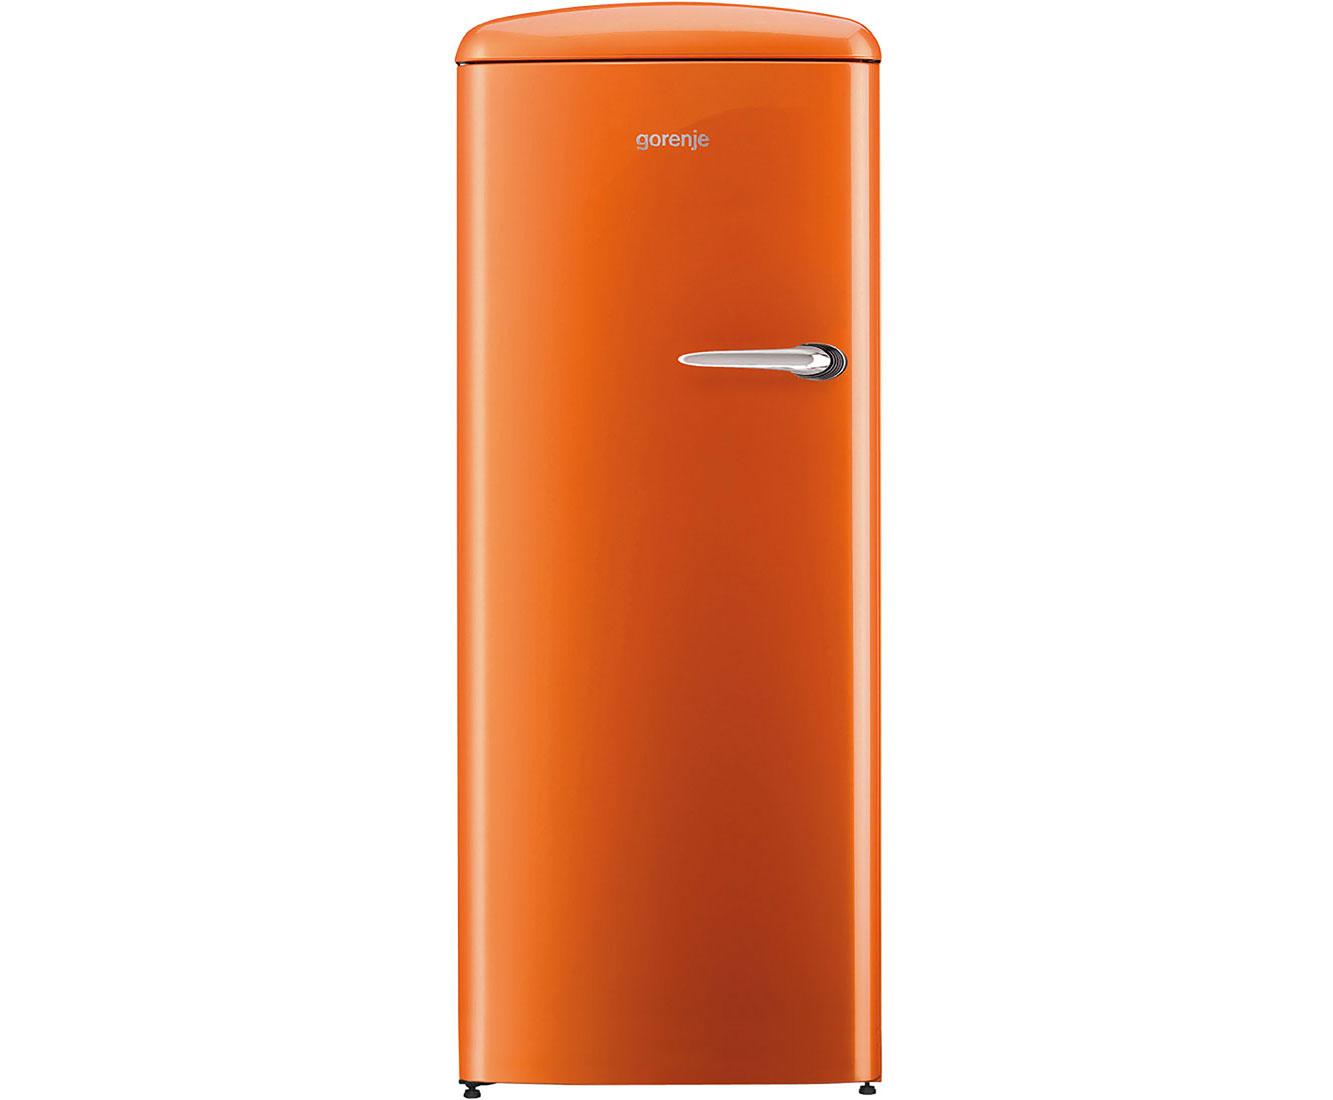 Gorenje Kühlschrank Preisvergleich : Retro kühlschrank ohne gefrierfach gorenje orb 153 xl kühlschrank